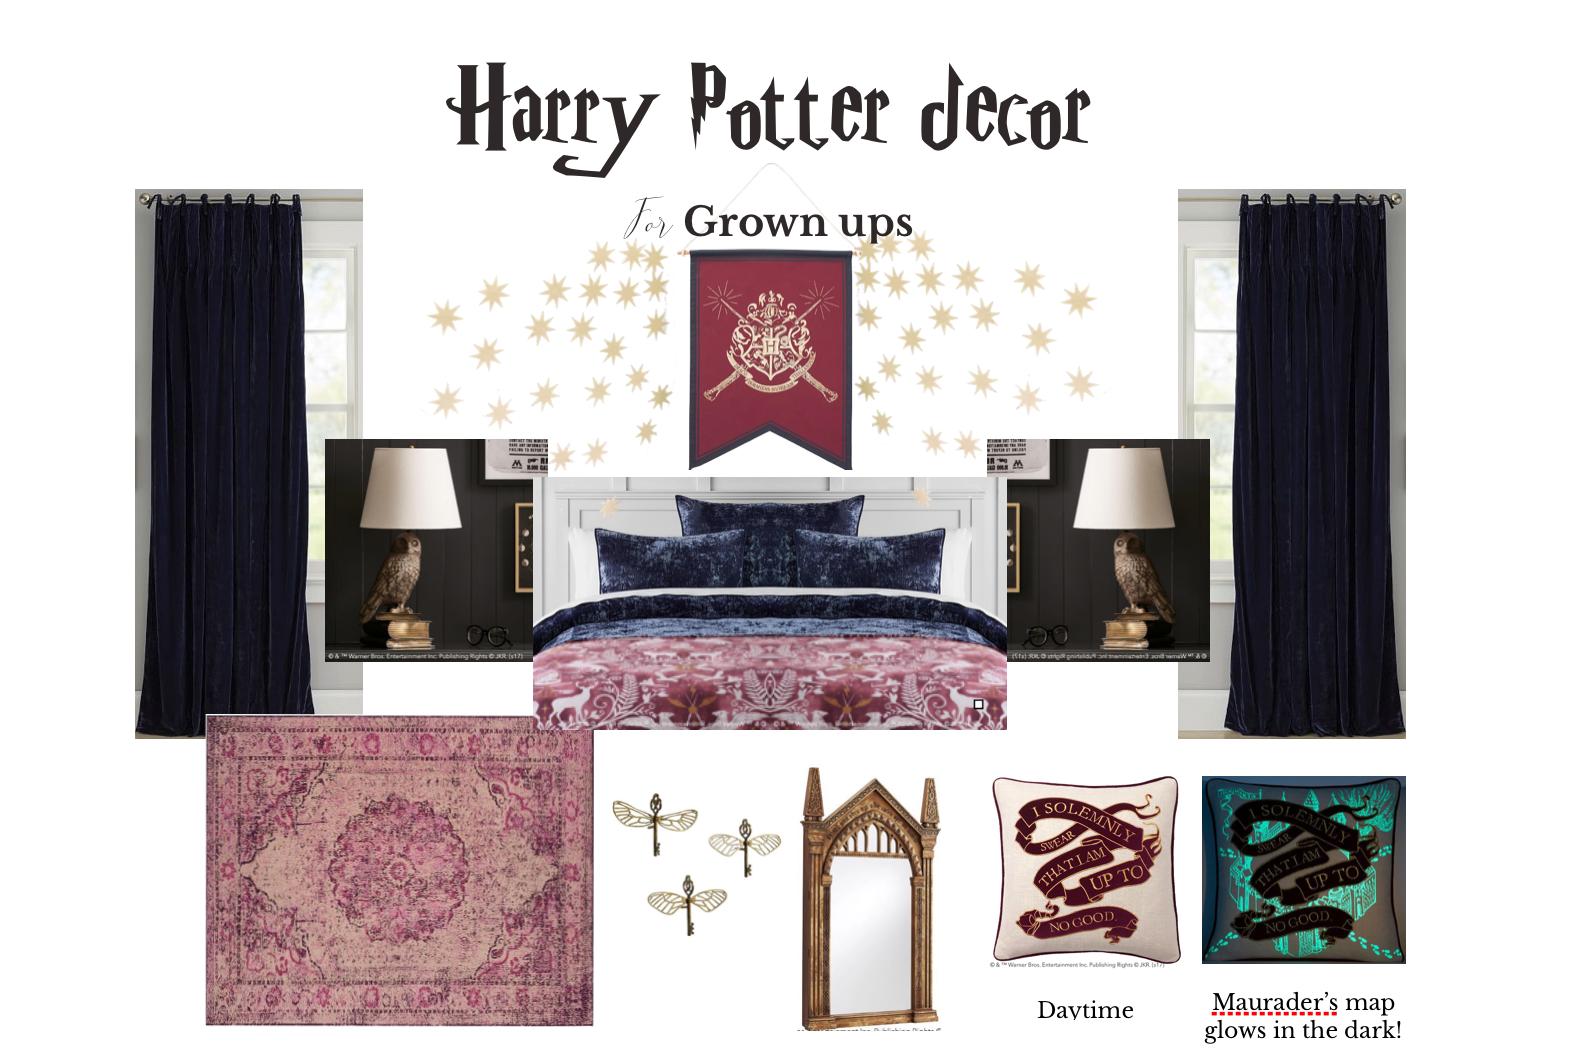 grownups, Harry potter fans, sophisticated, Marilyn taylor,